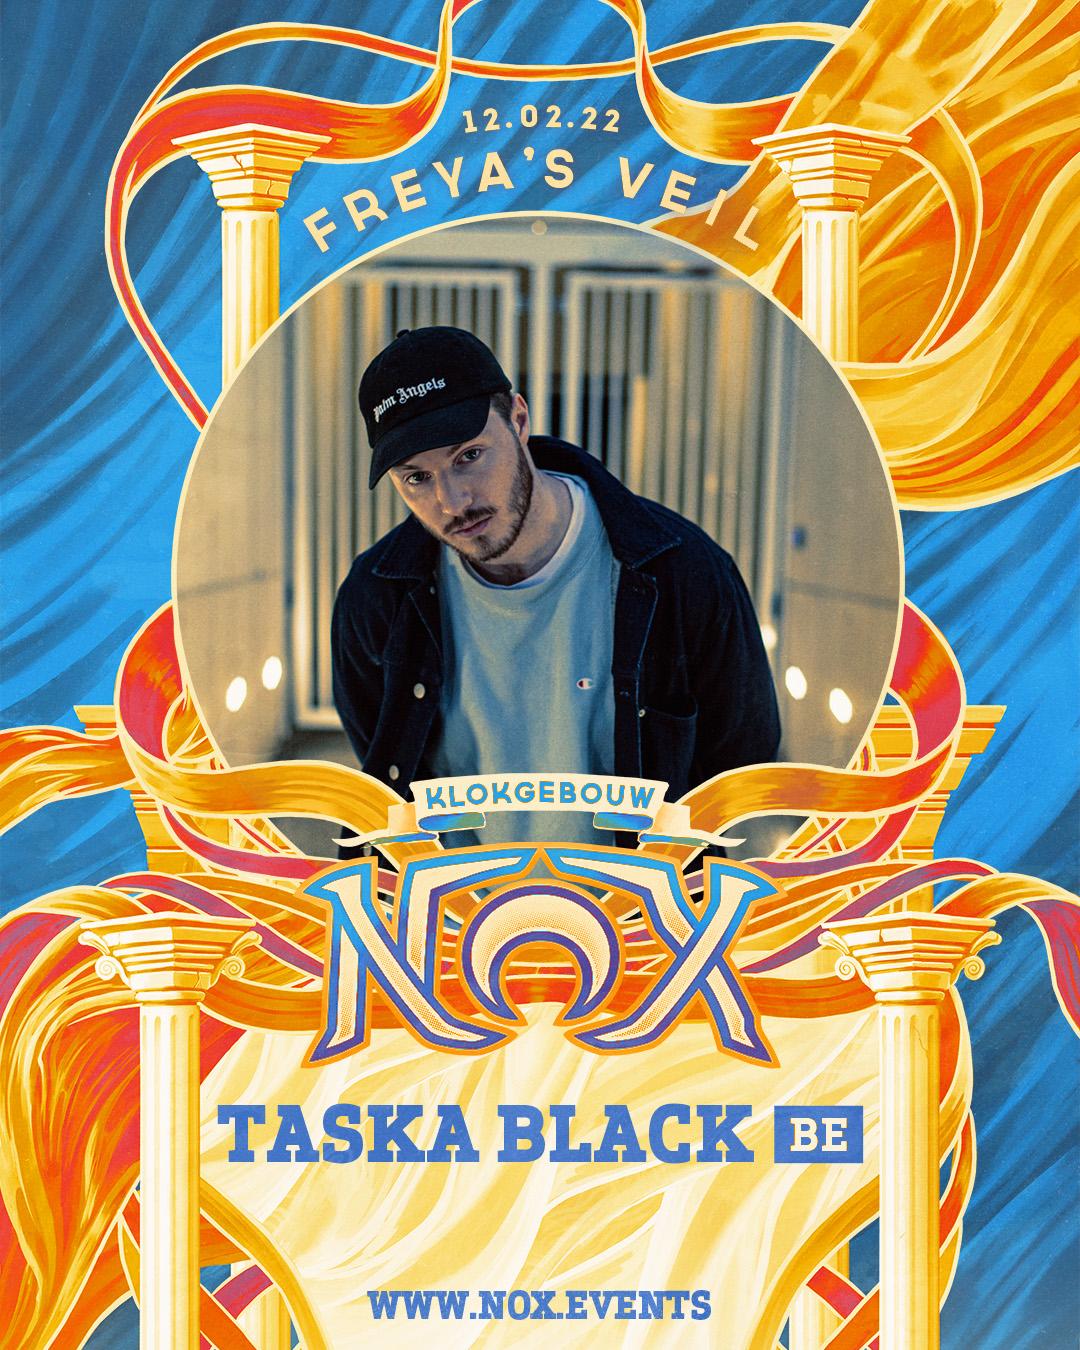 Taska Black